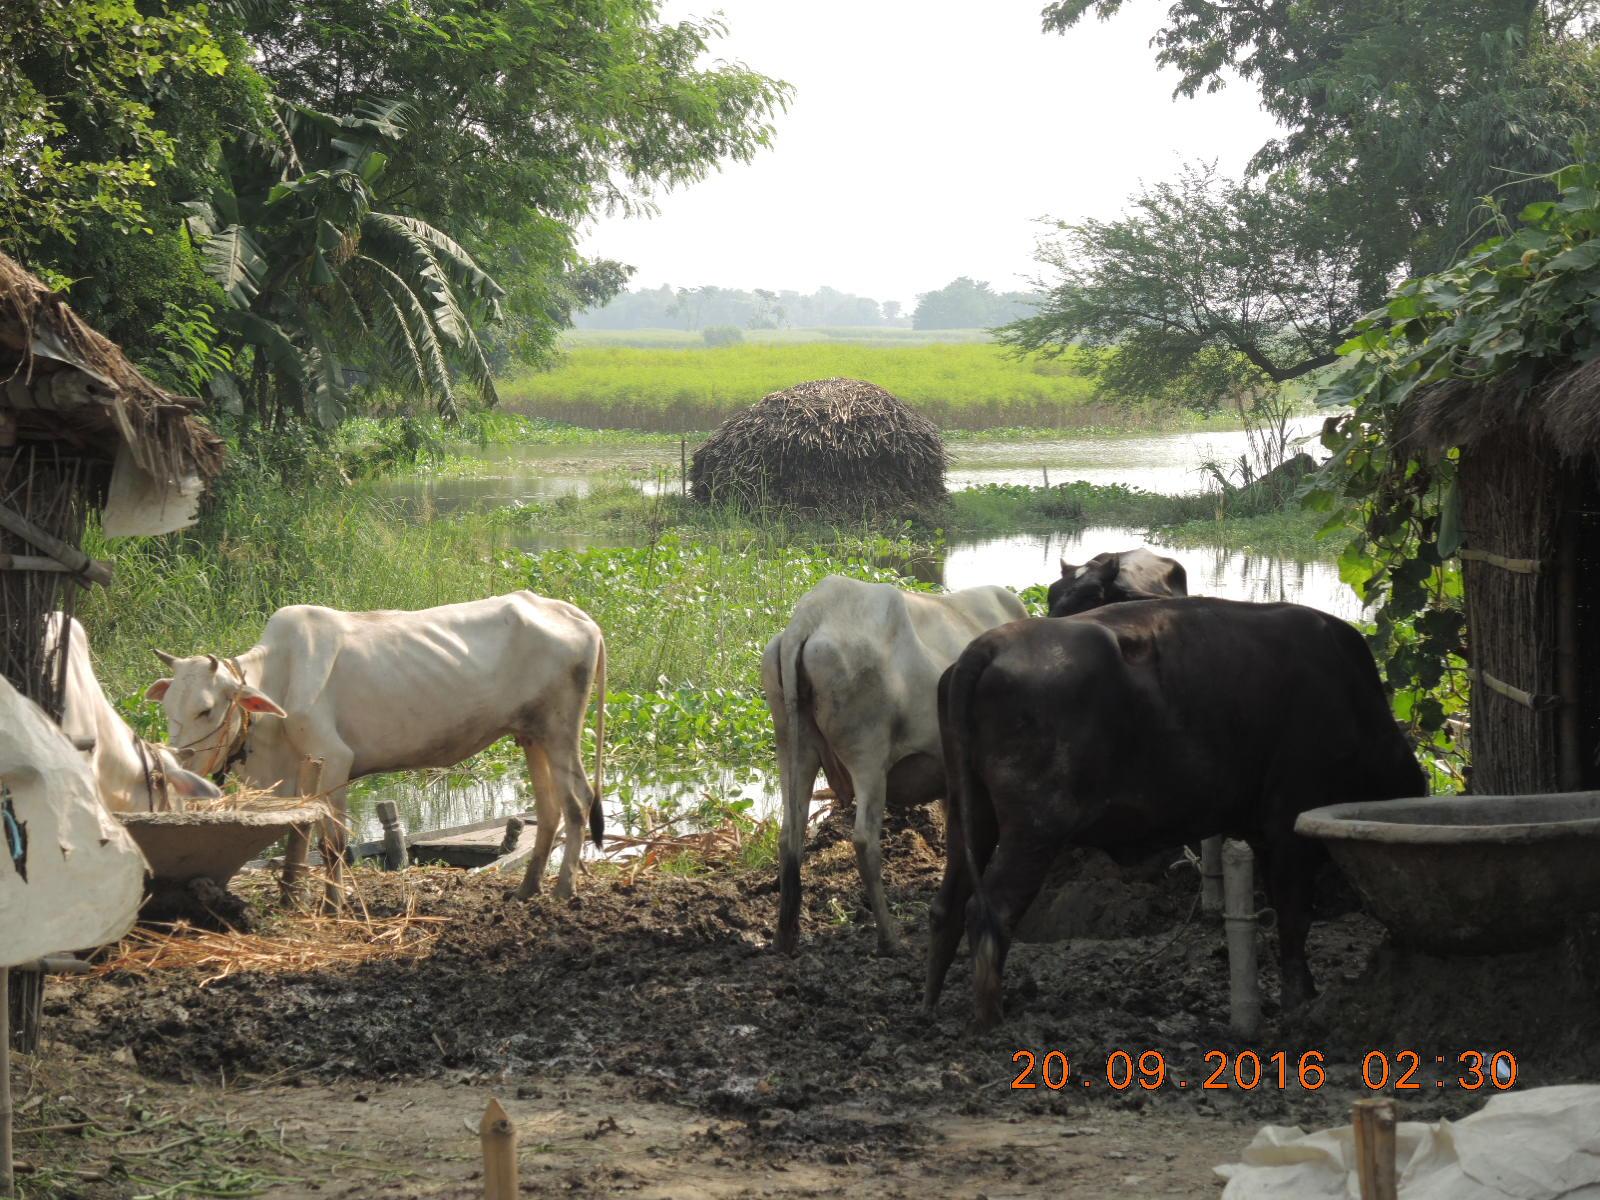 A waterlogged patch of land in a village in Kosi. Credit: Ranjeet Kumar Sahani